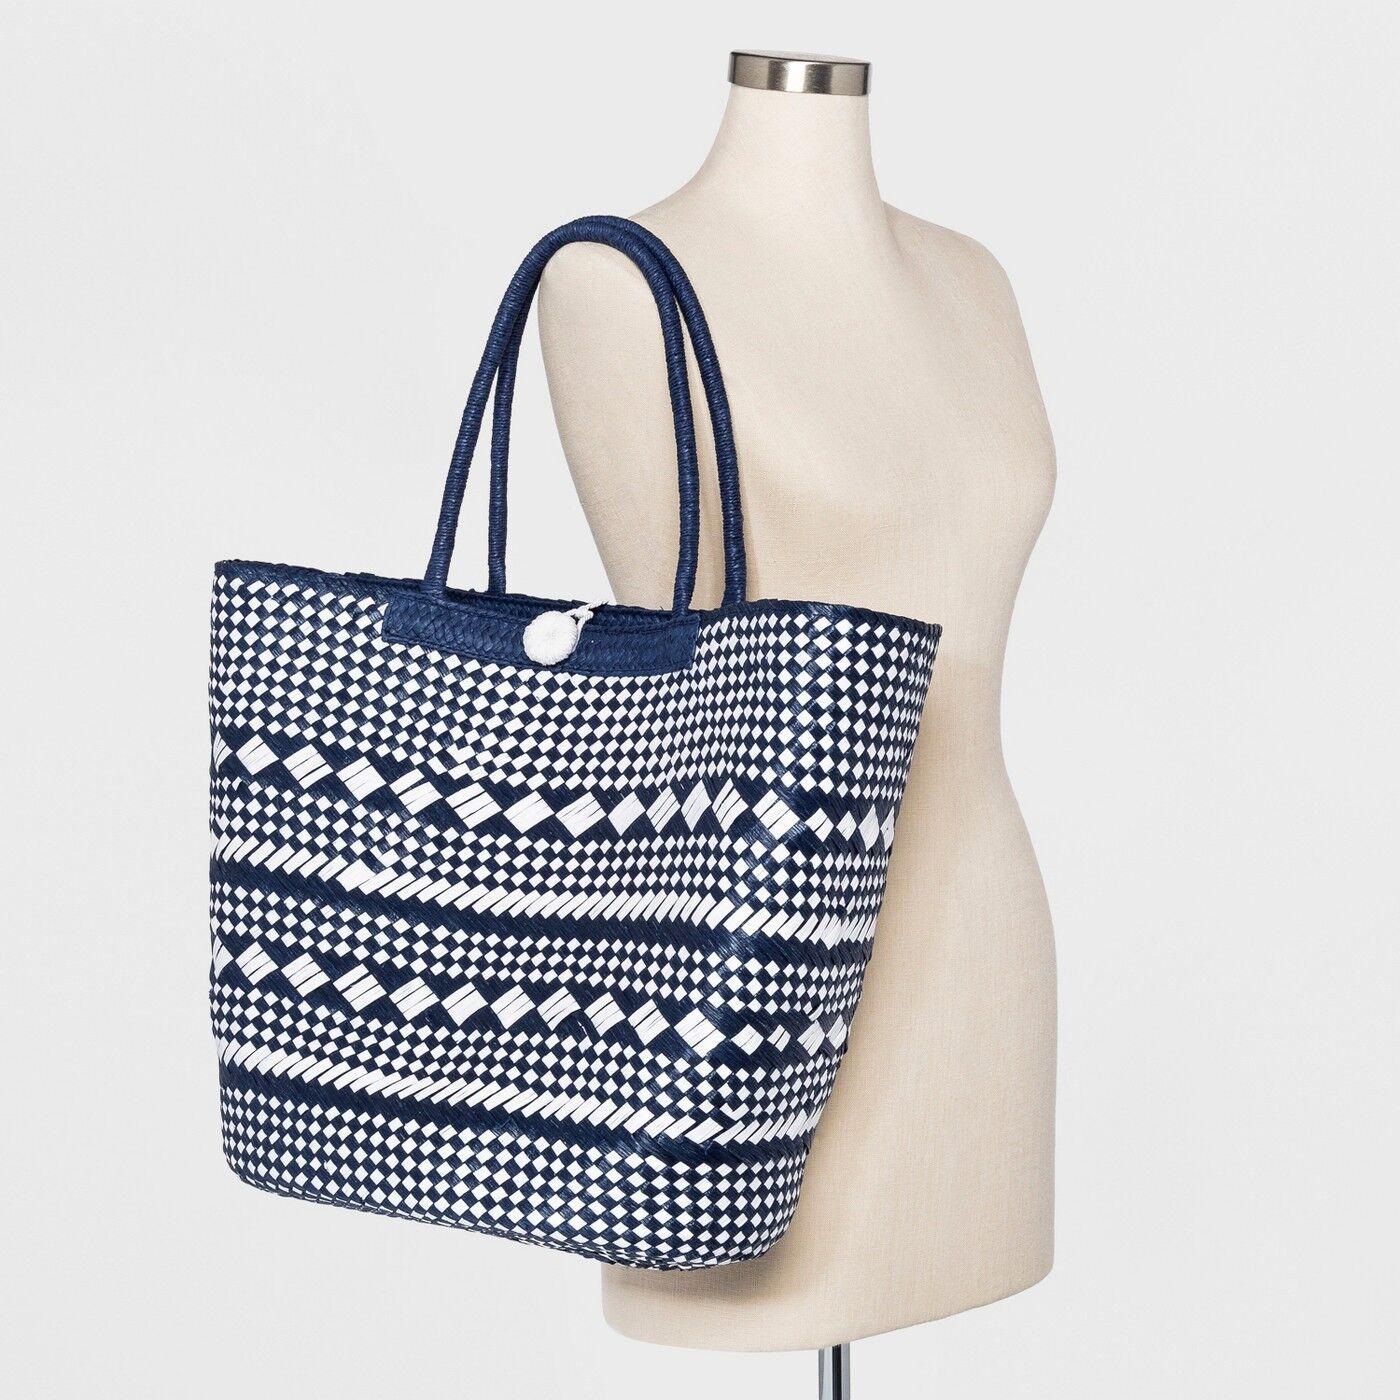 48a444f45bb Plaid Straw Tote Handbag - a Day Black/natural